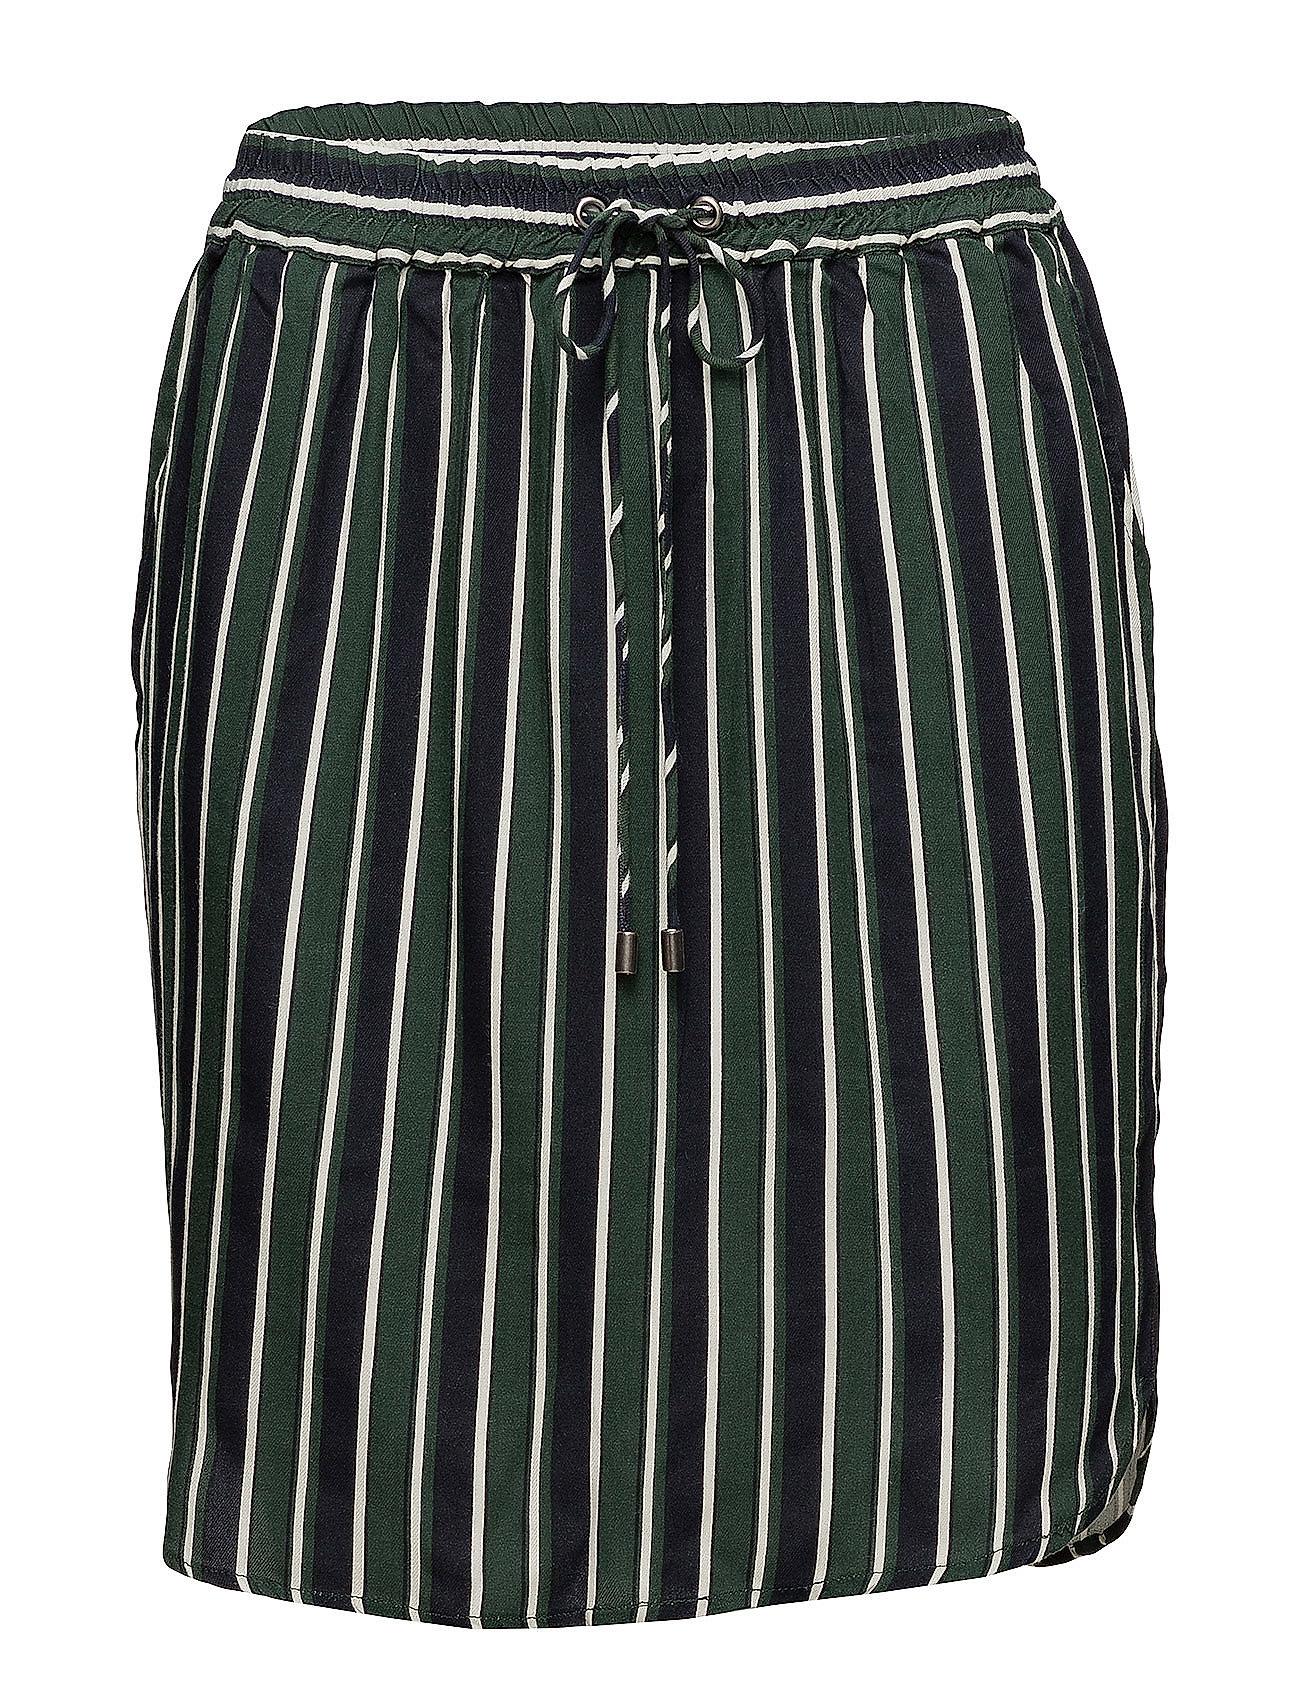 Image of Stripe P Skirt (2926681037)